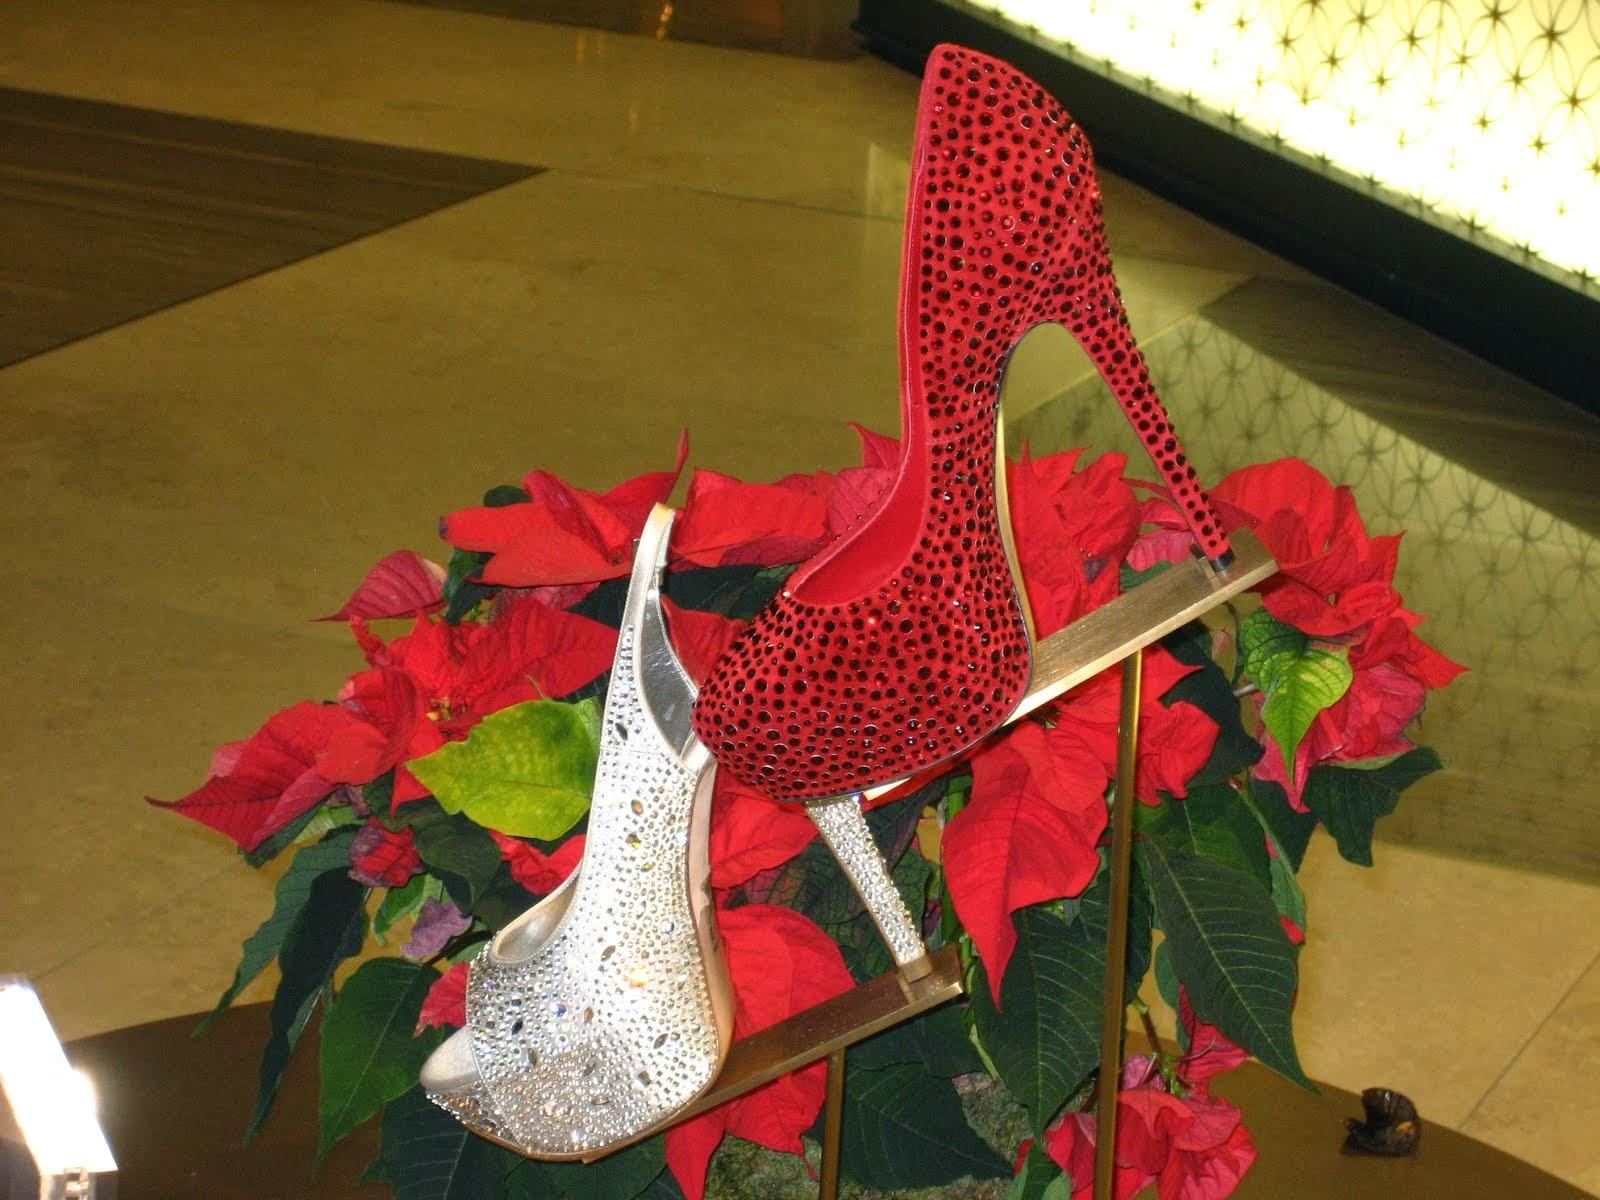 Schuhsehnsucht